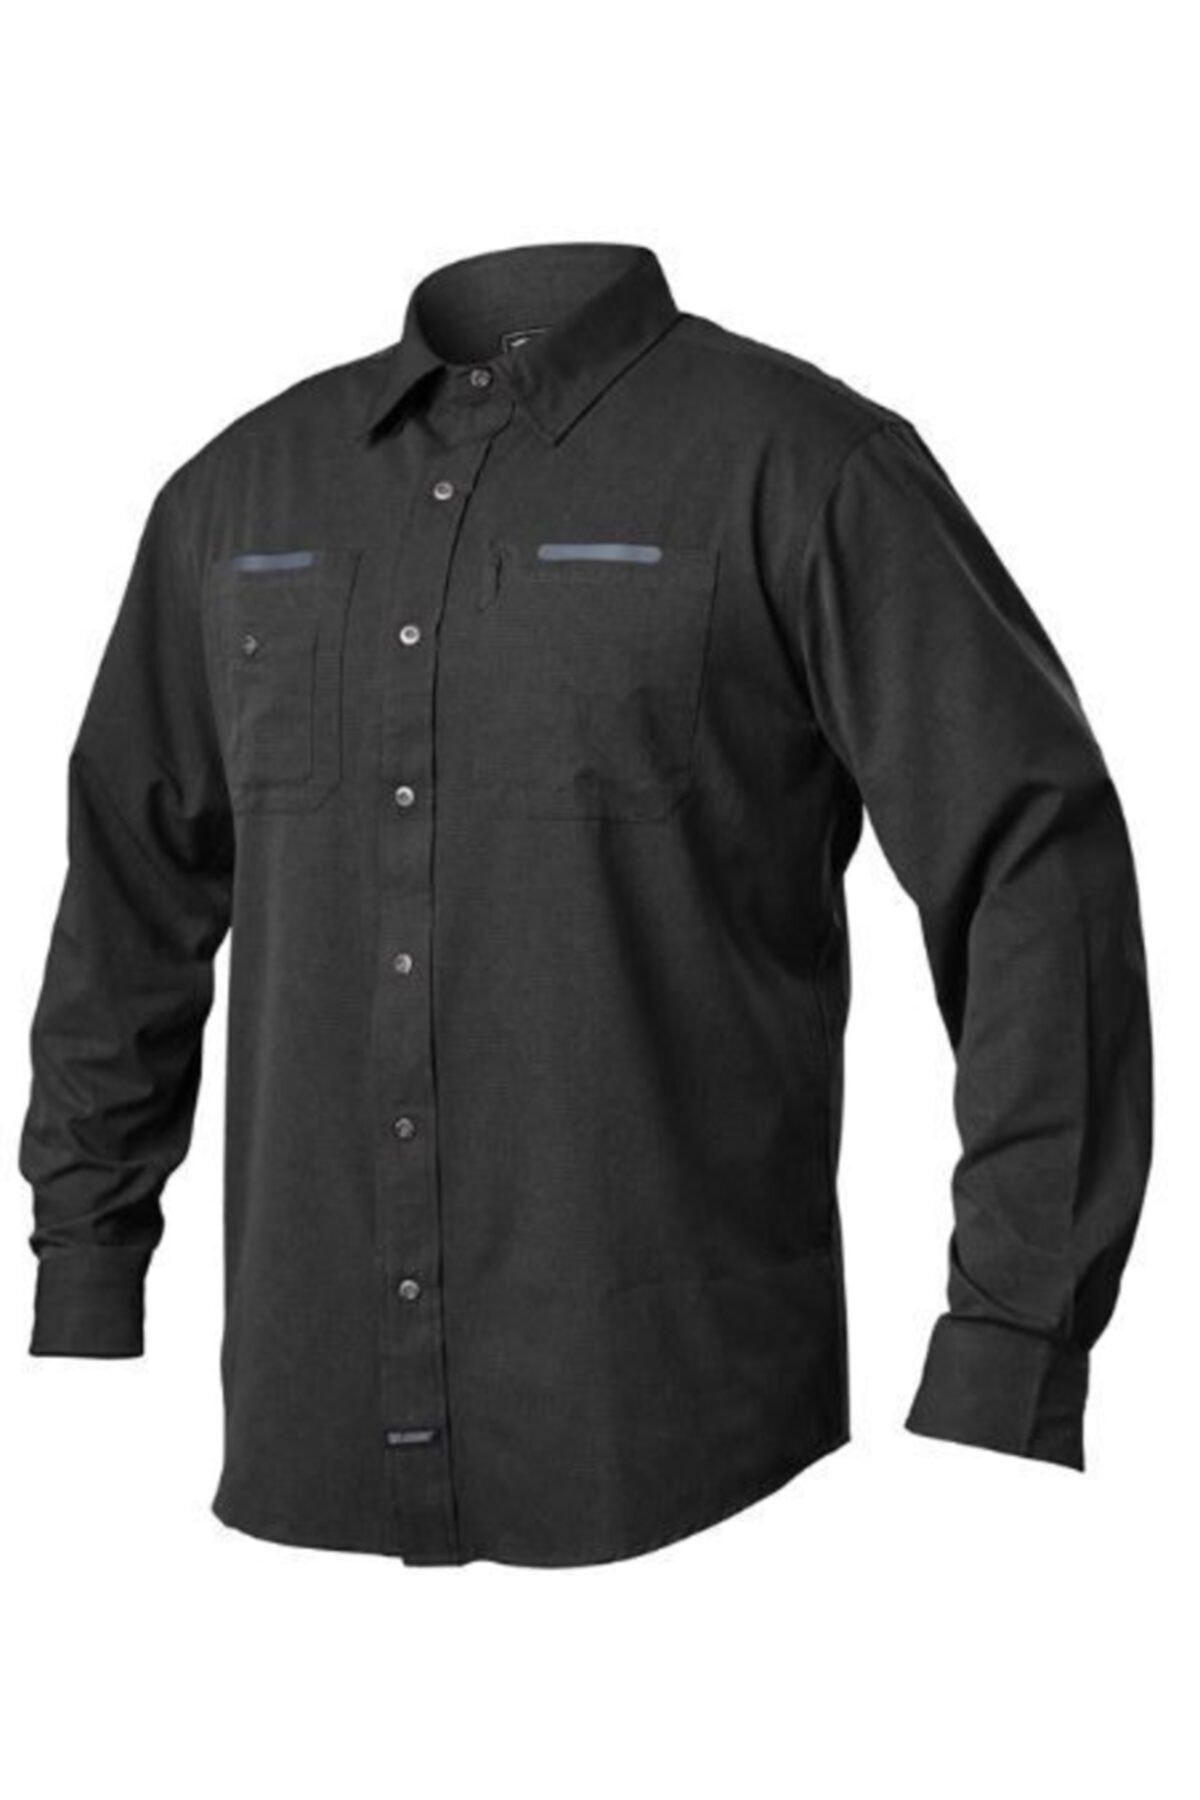 Blackhawk ! Tac Flow Shirt 2